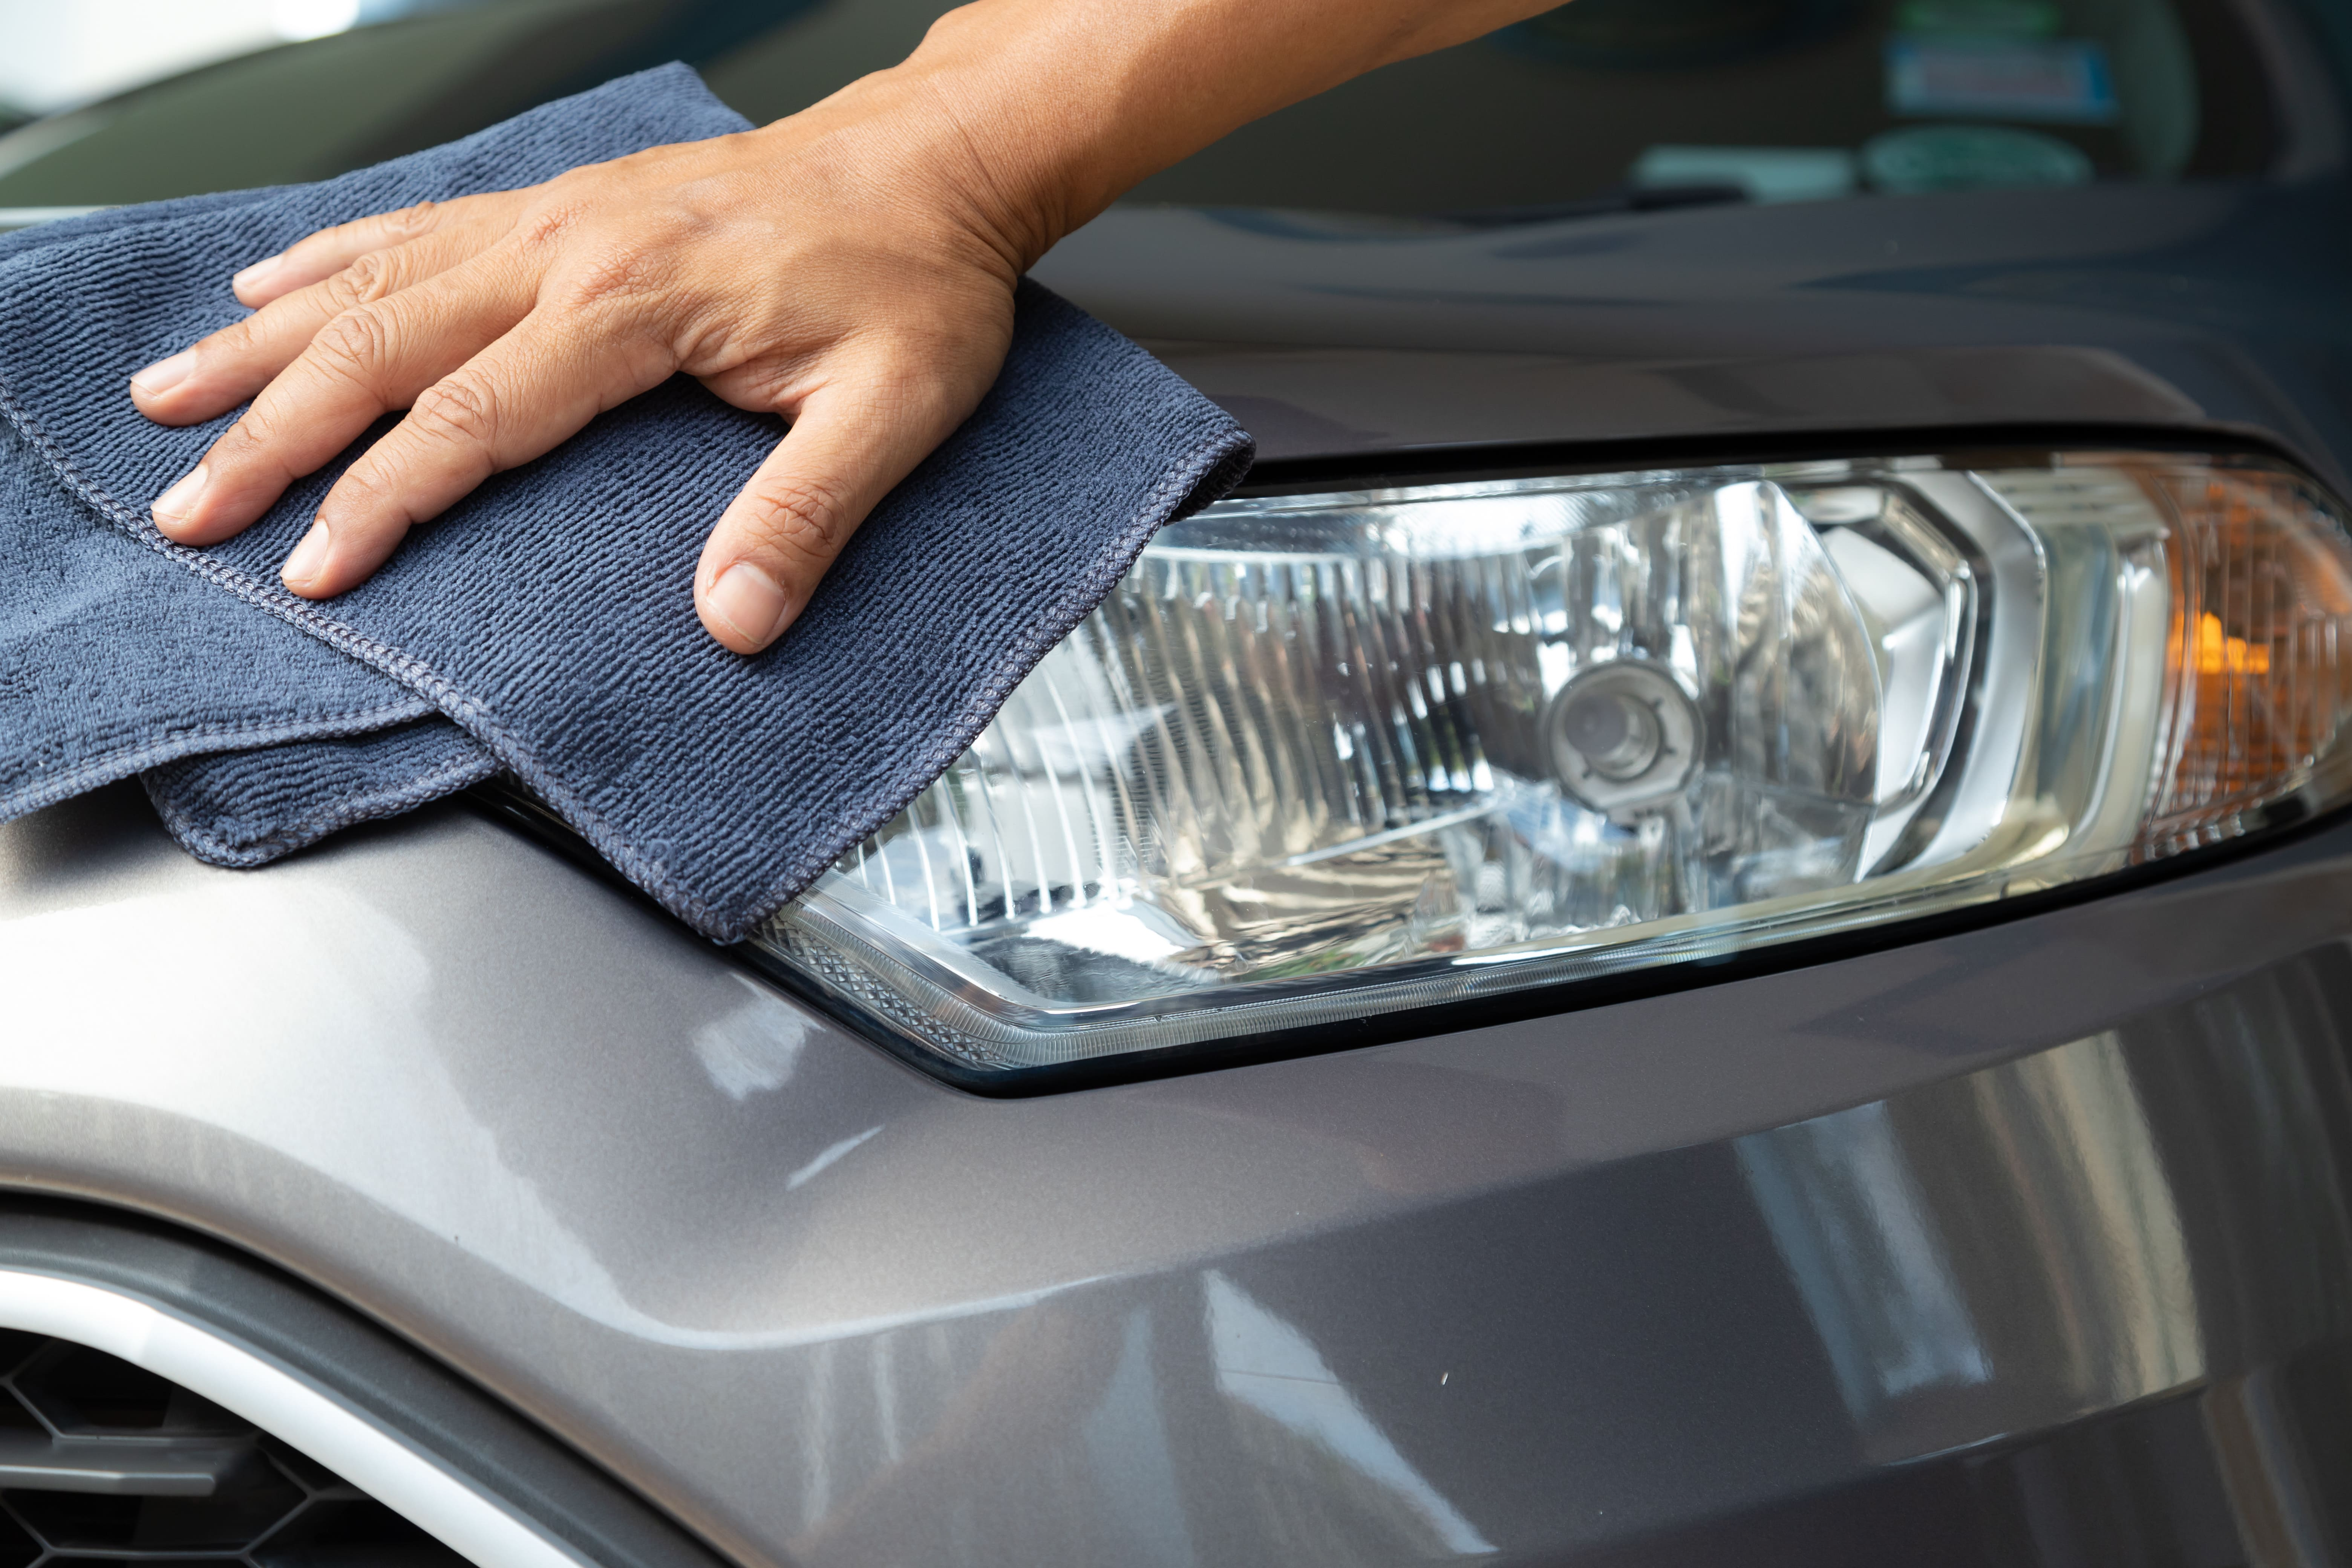 Headlights, Car Maintenance, Towel